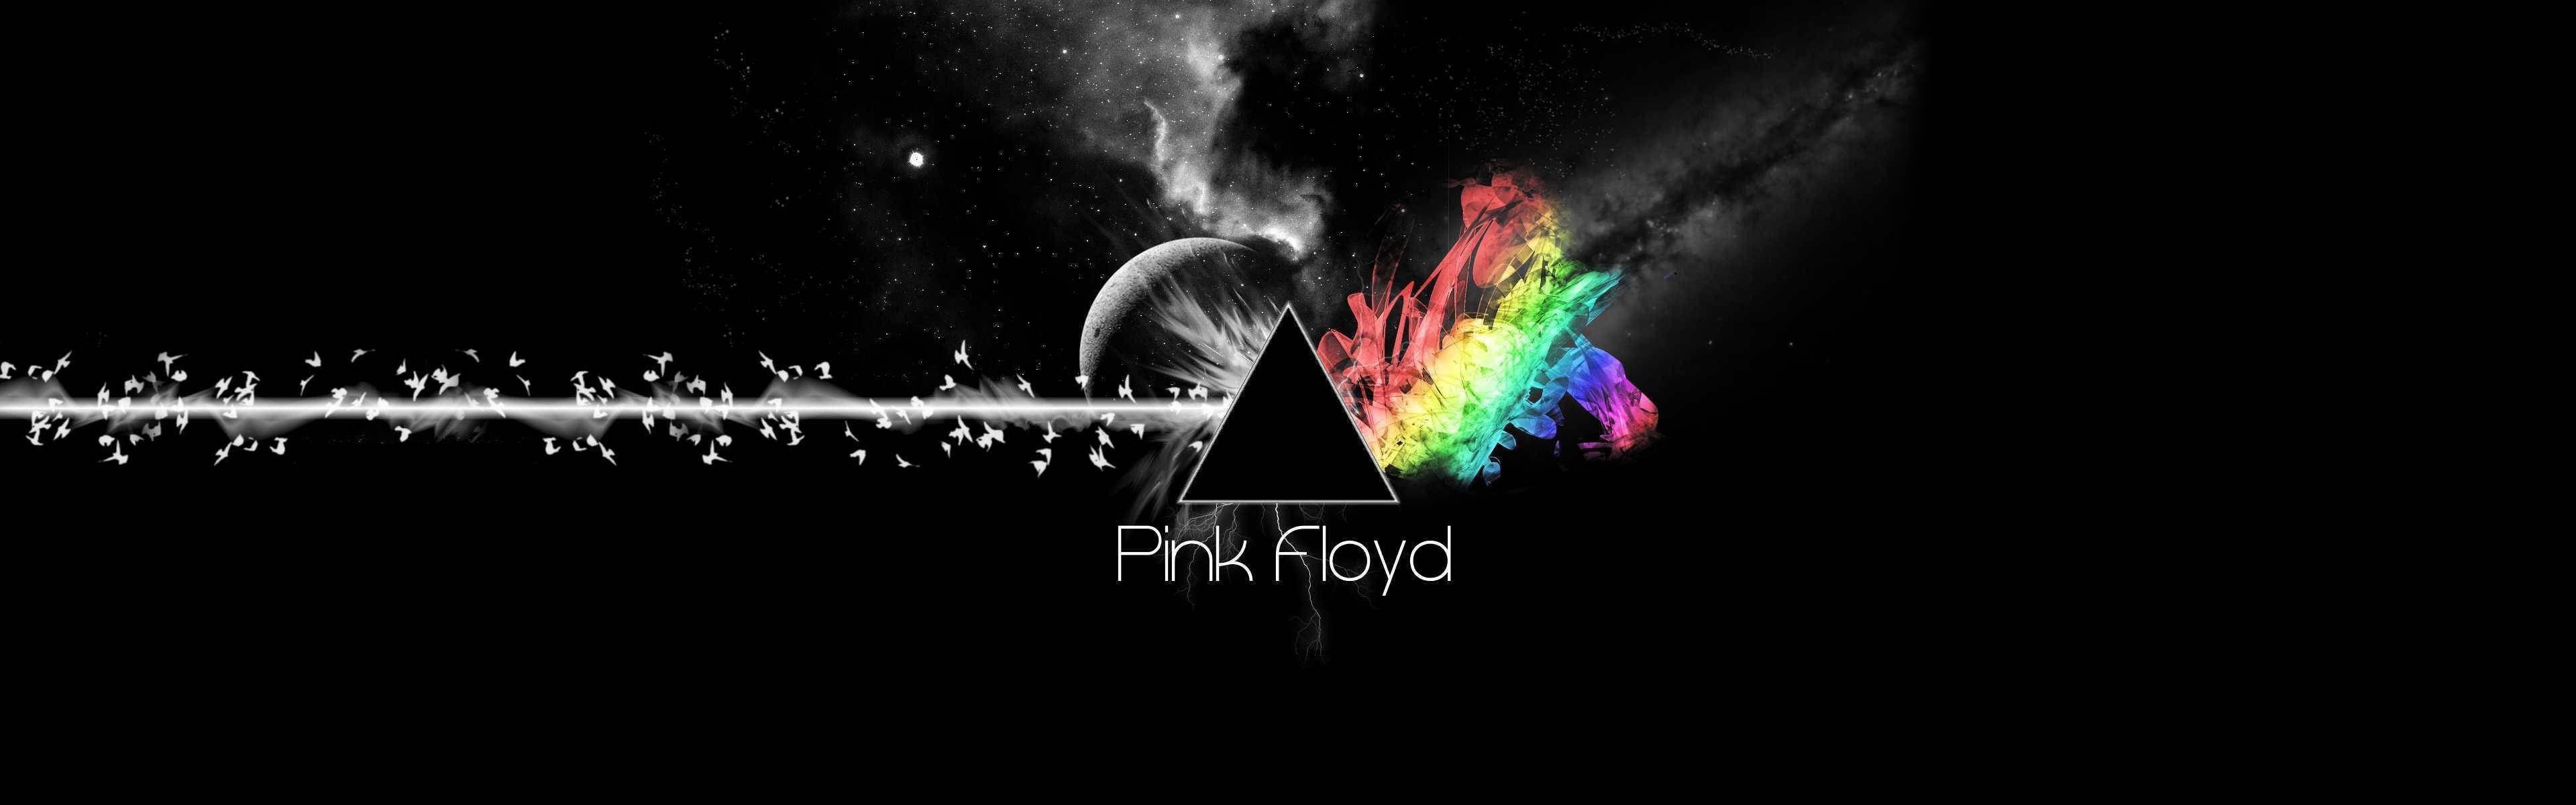 Pink Floyd 38401200 Wallpaper 775038 3840x1200